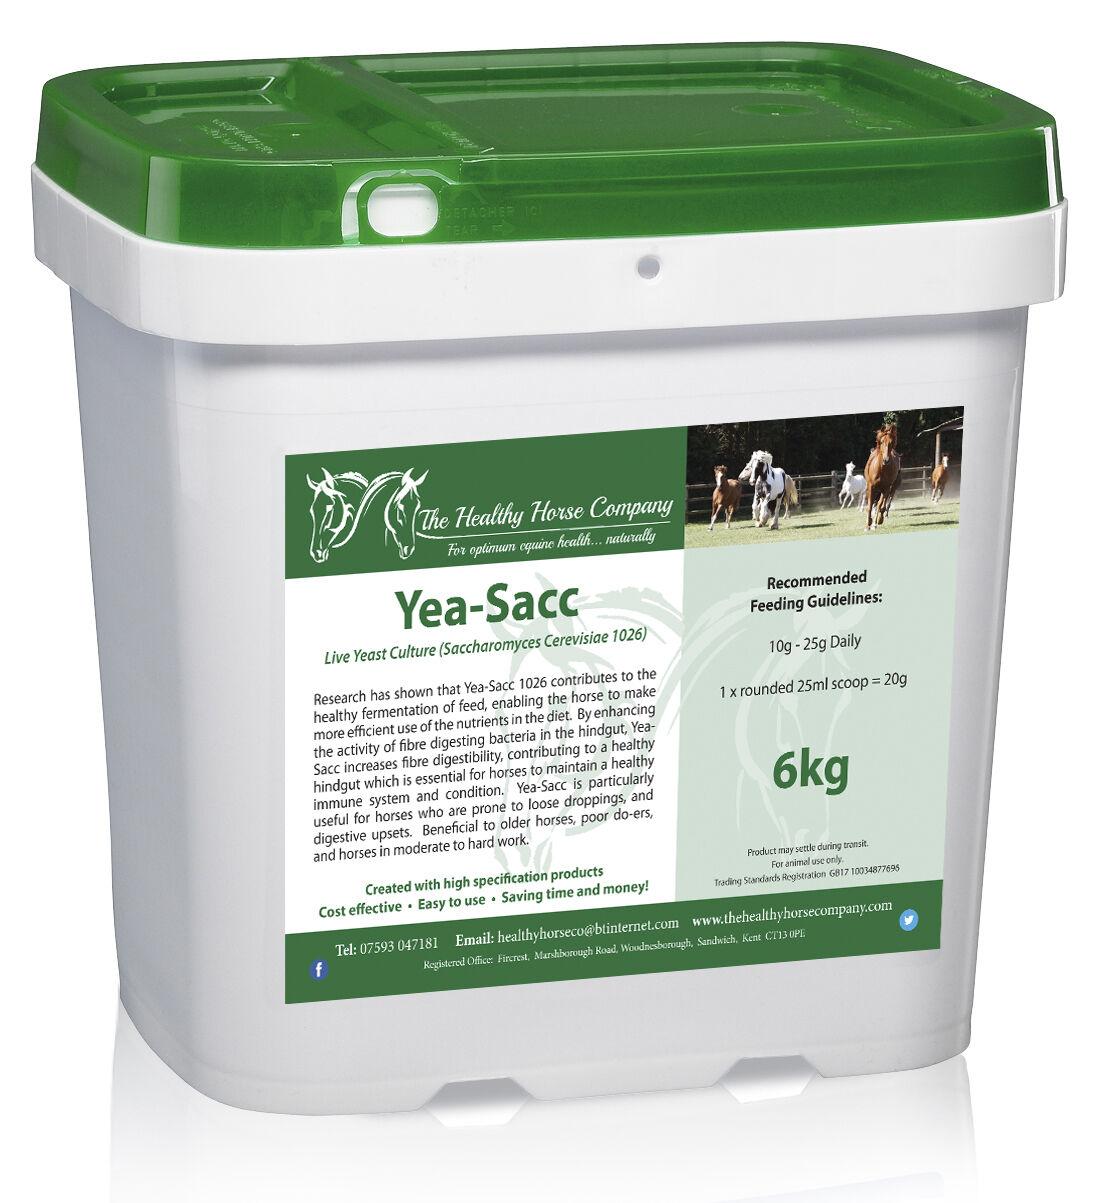 Yea-Sacc1026 6kg Refill (Digestion, Immune System)